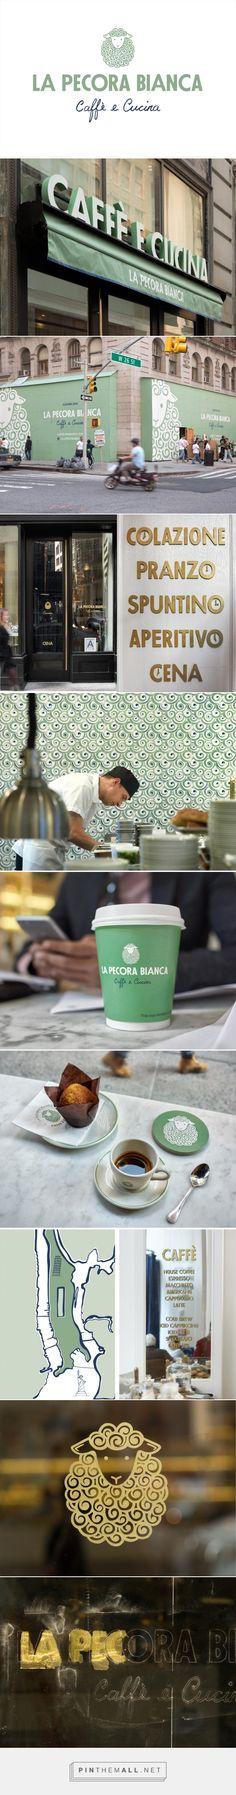 Brand Identity for La Pecora Bianca by Pentagram — #Pattern